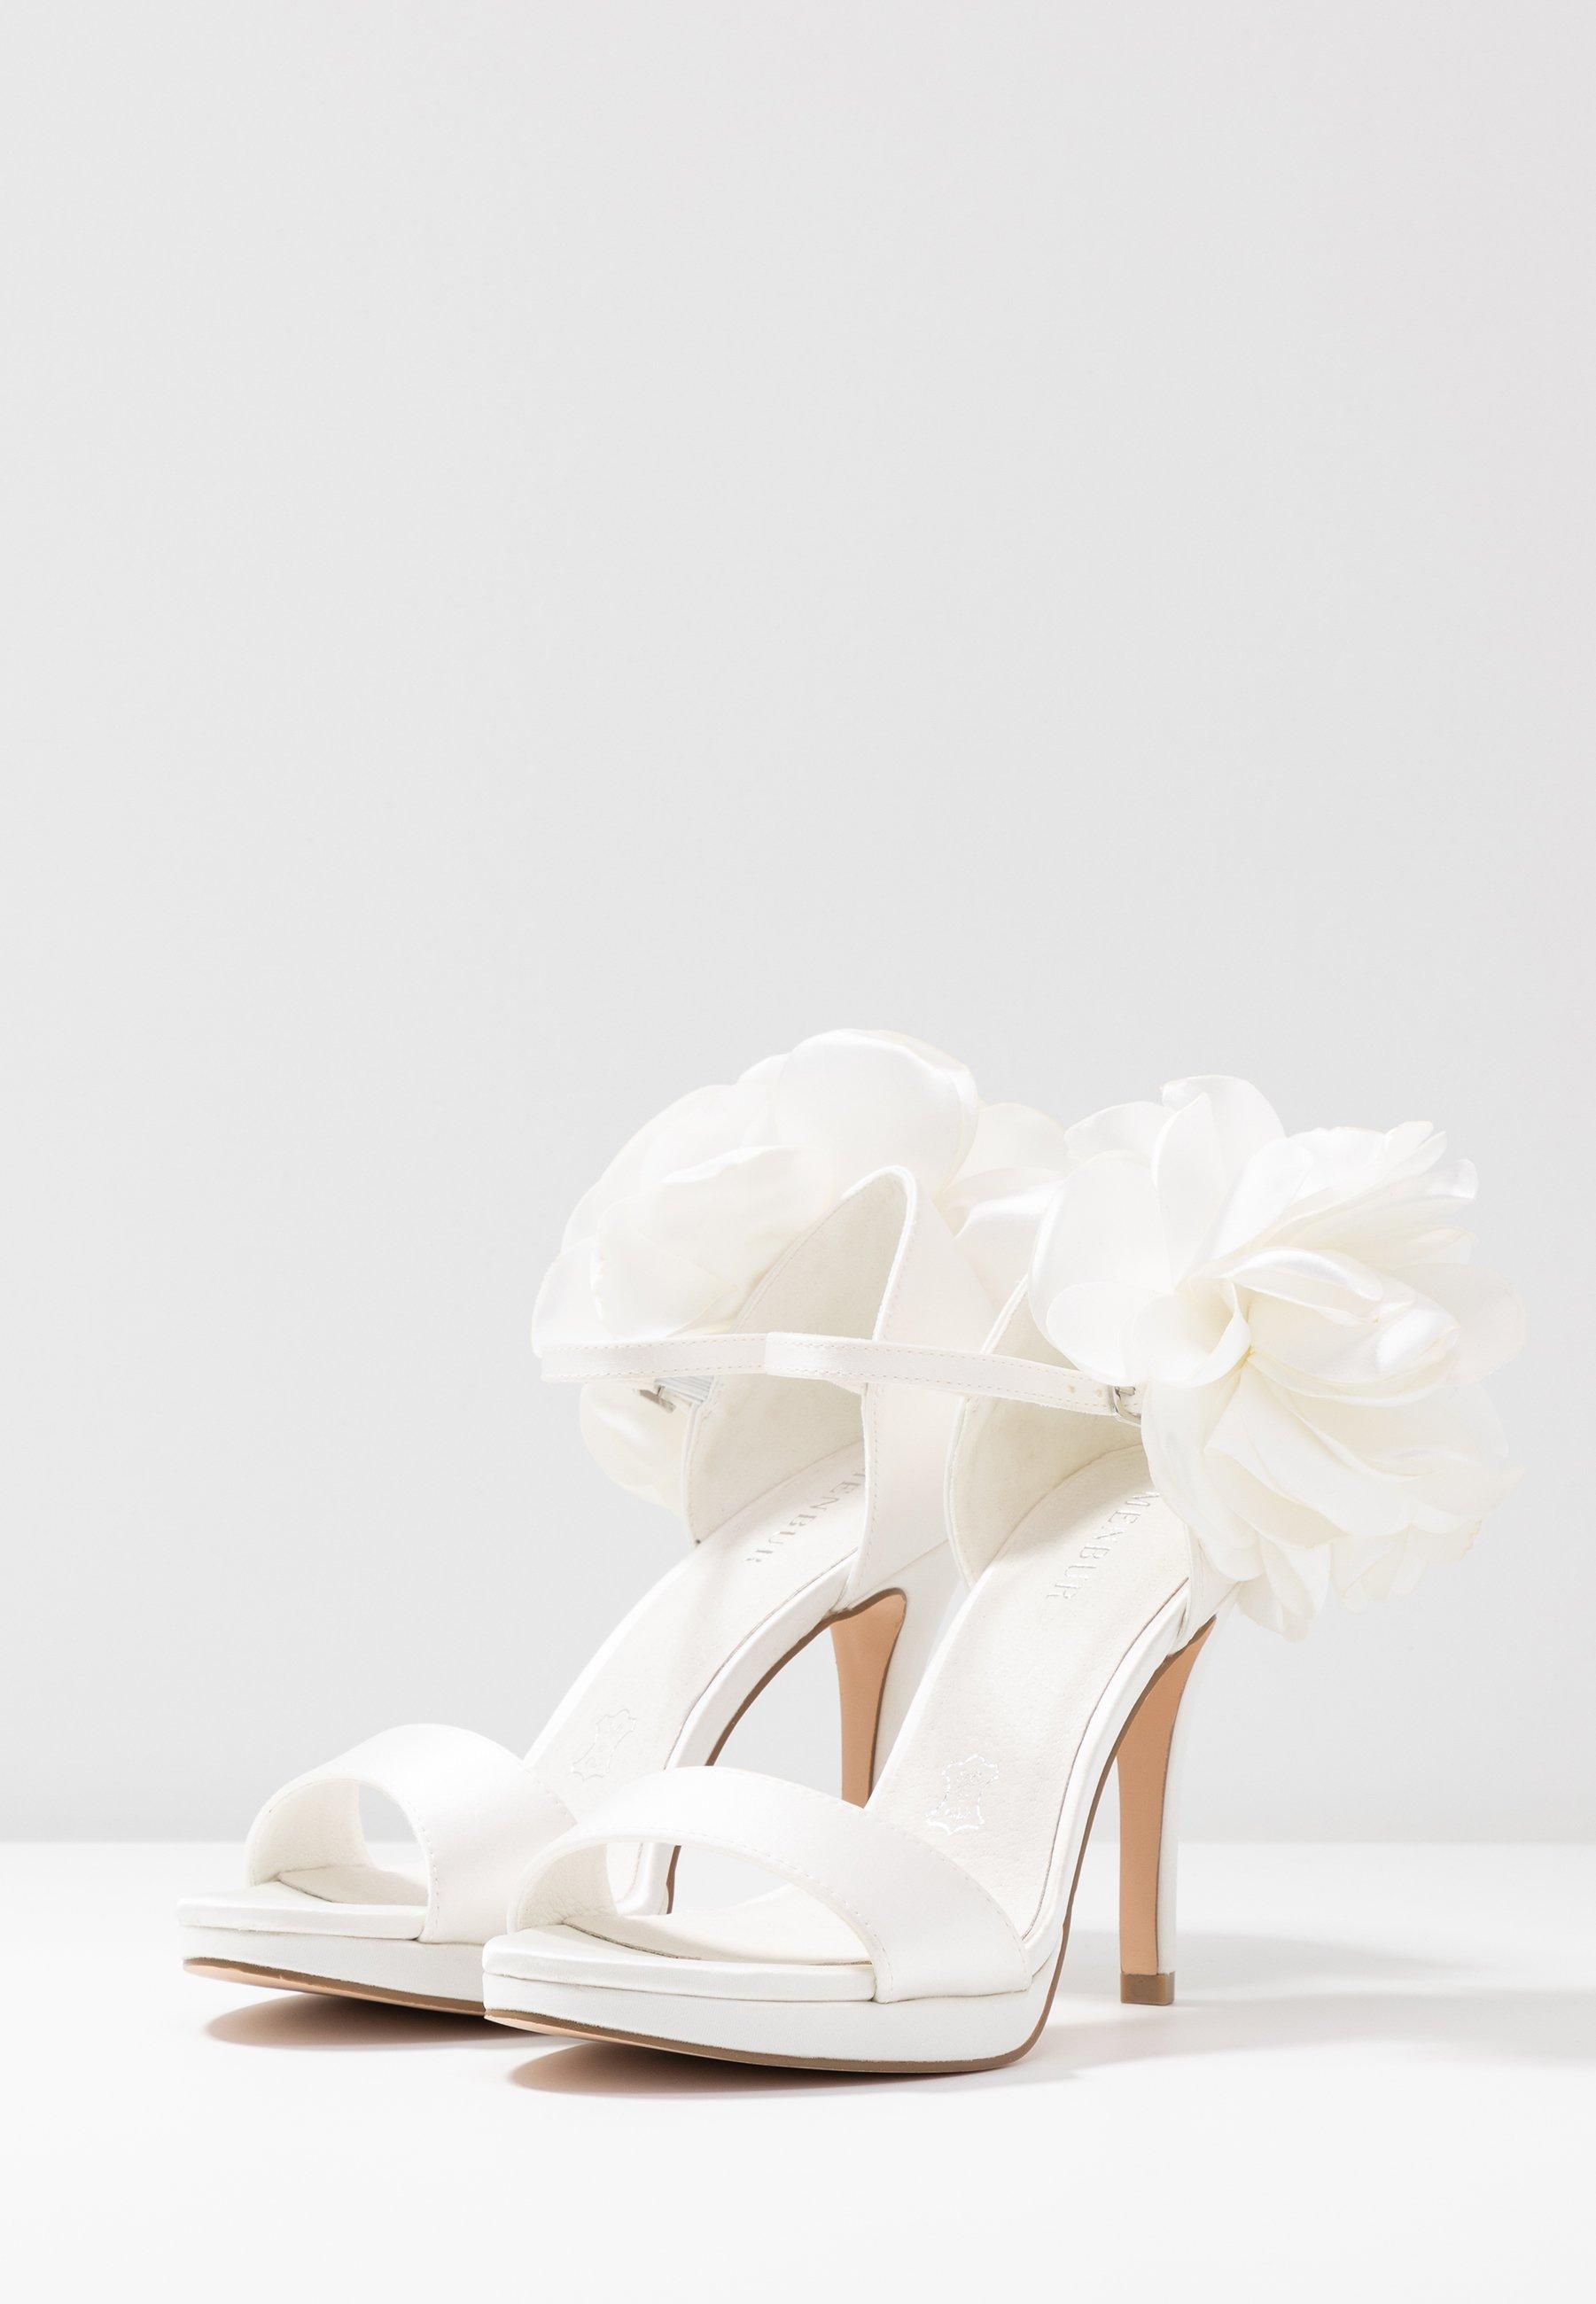 Menbur High Heel Sandalette ivory/weiß